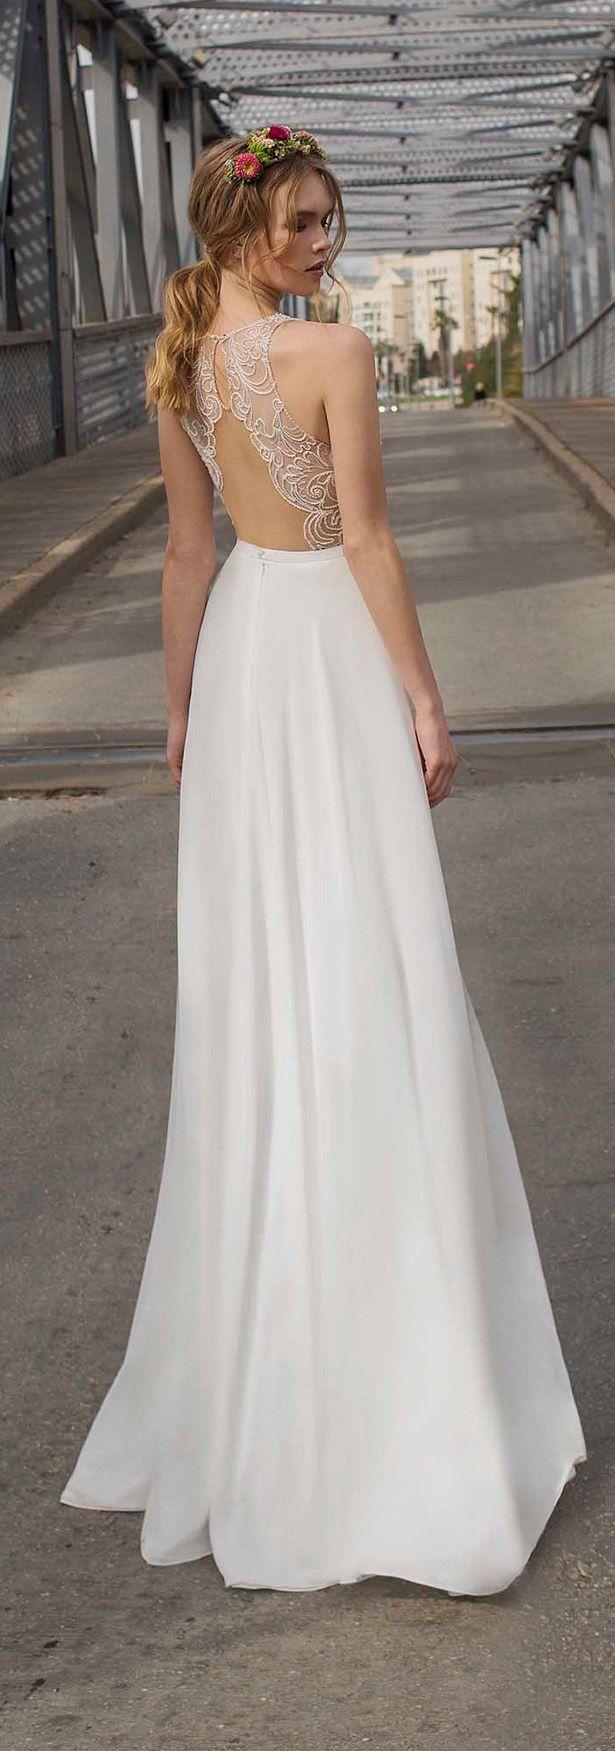 Pin On Wedding Dresses [ 1751 x 615 Pixel ]